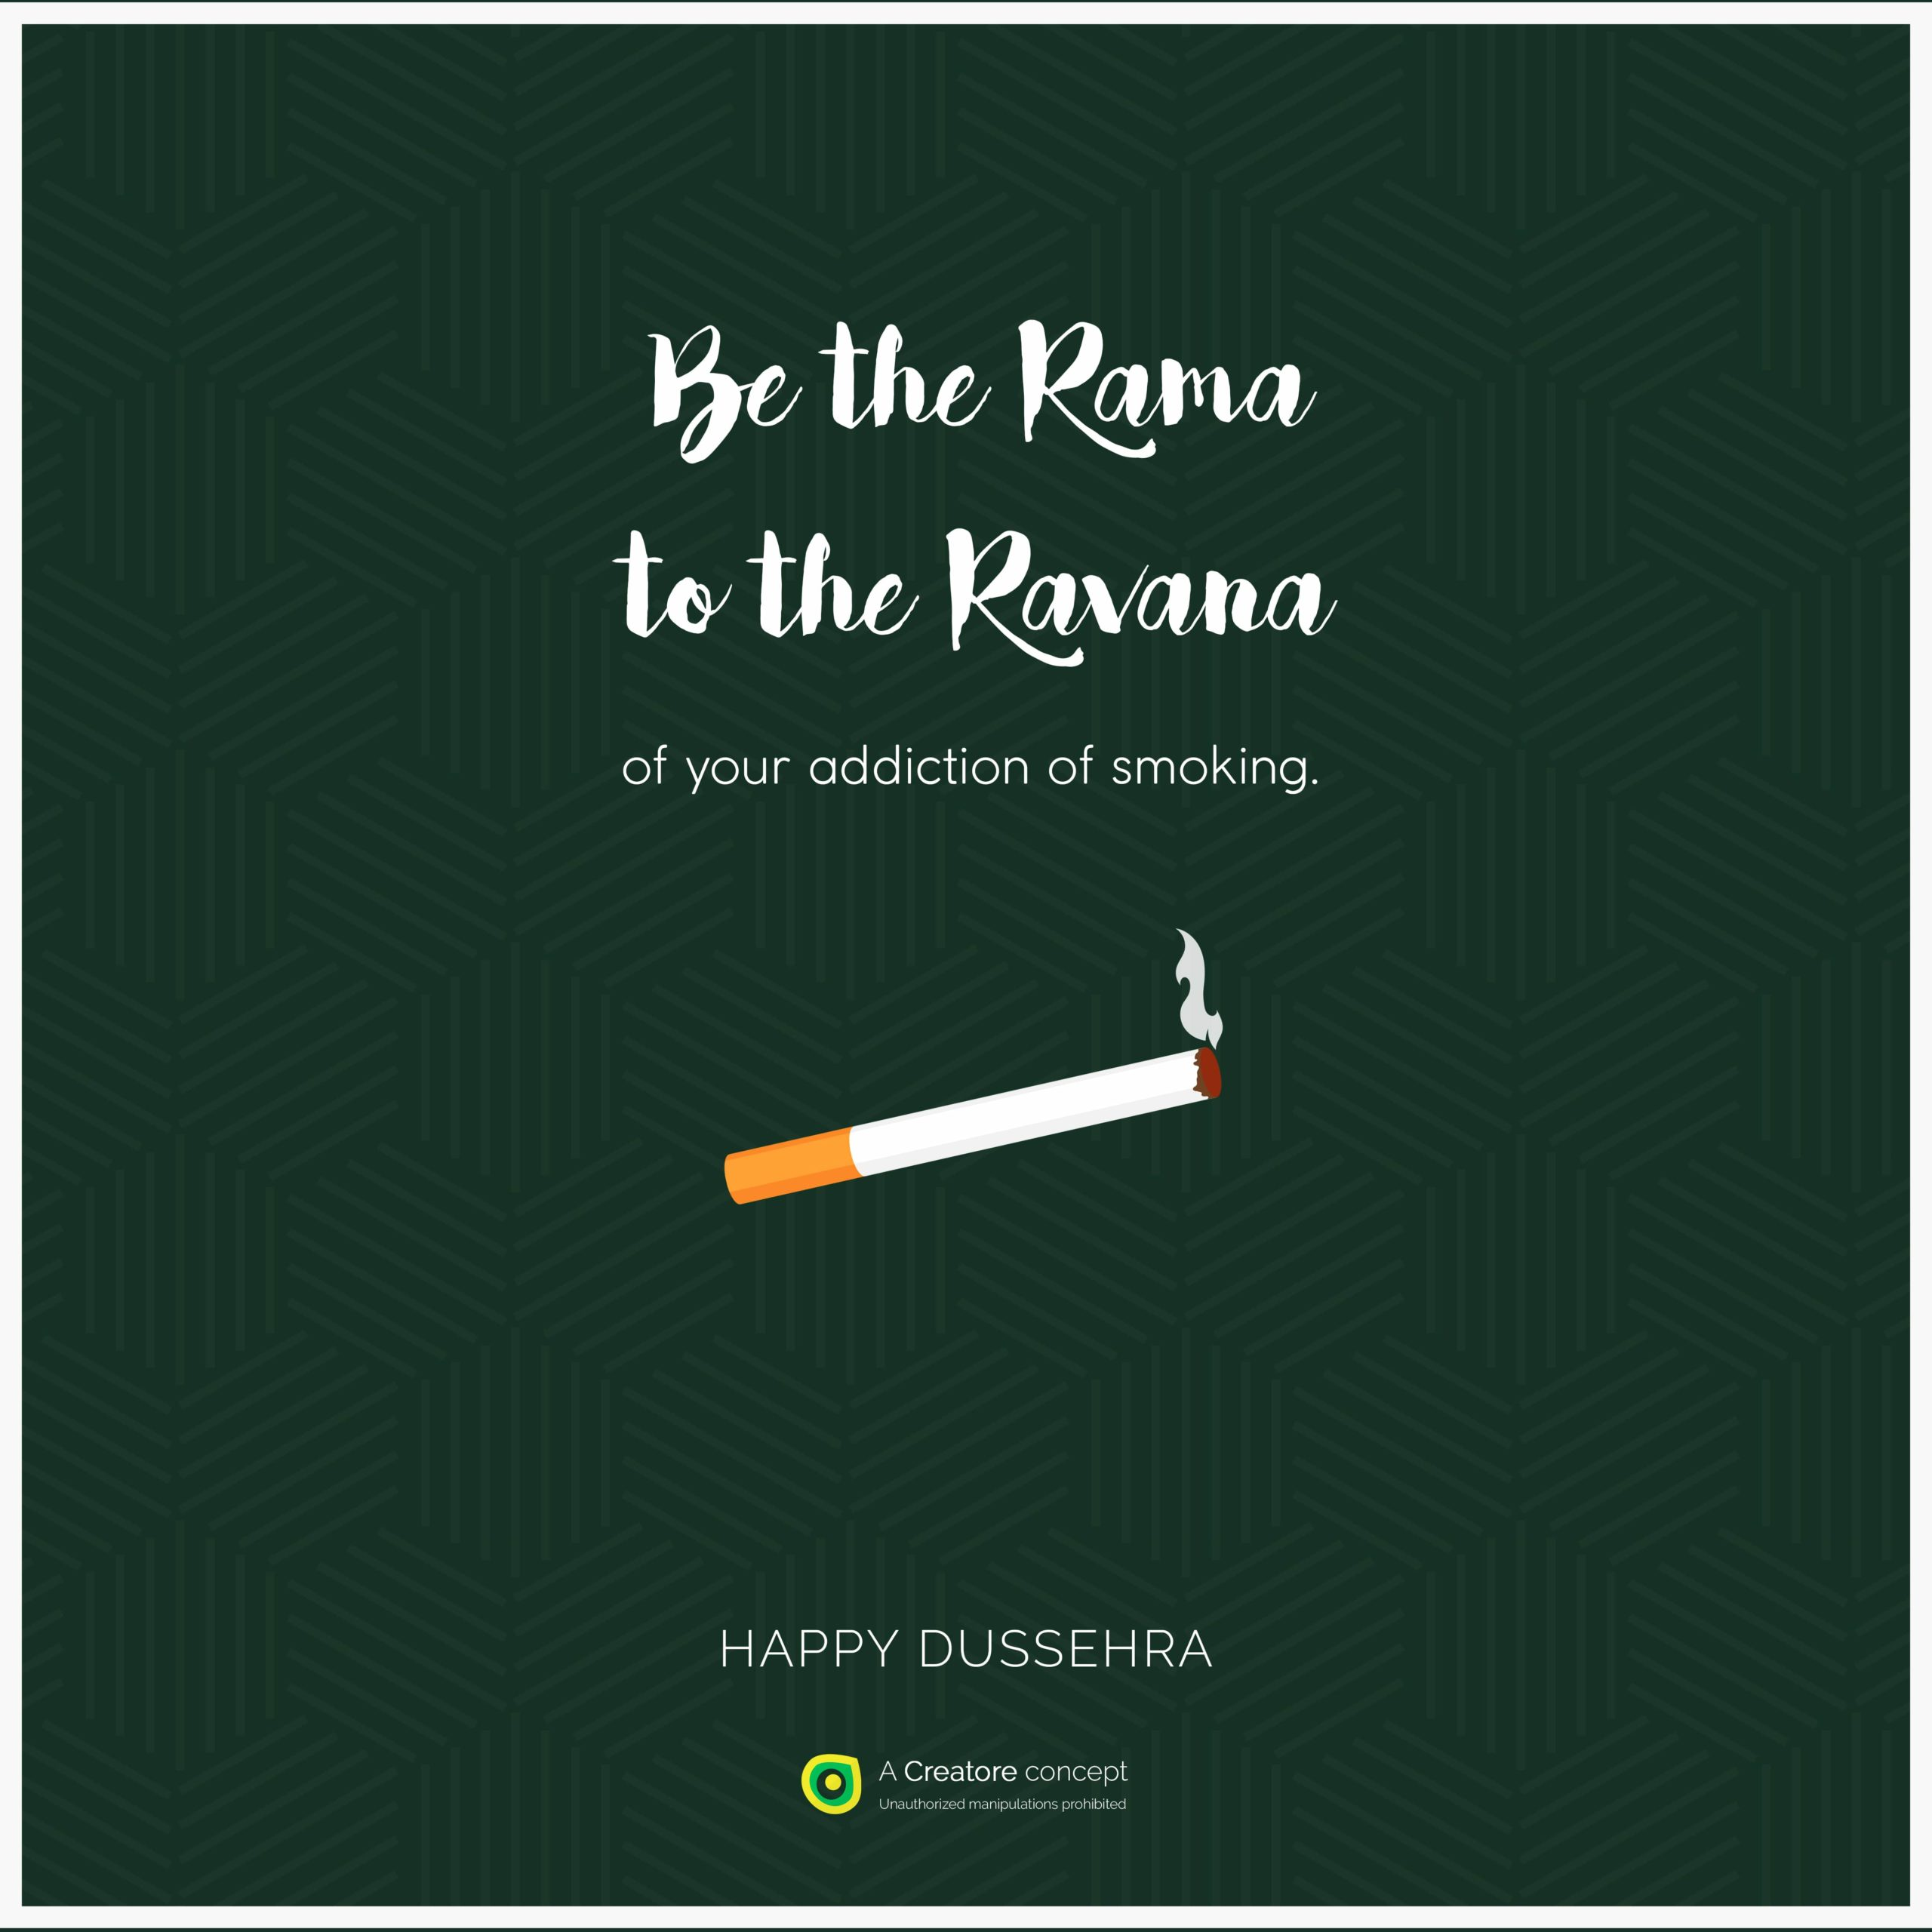 Dussehra-2018-Cigarette